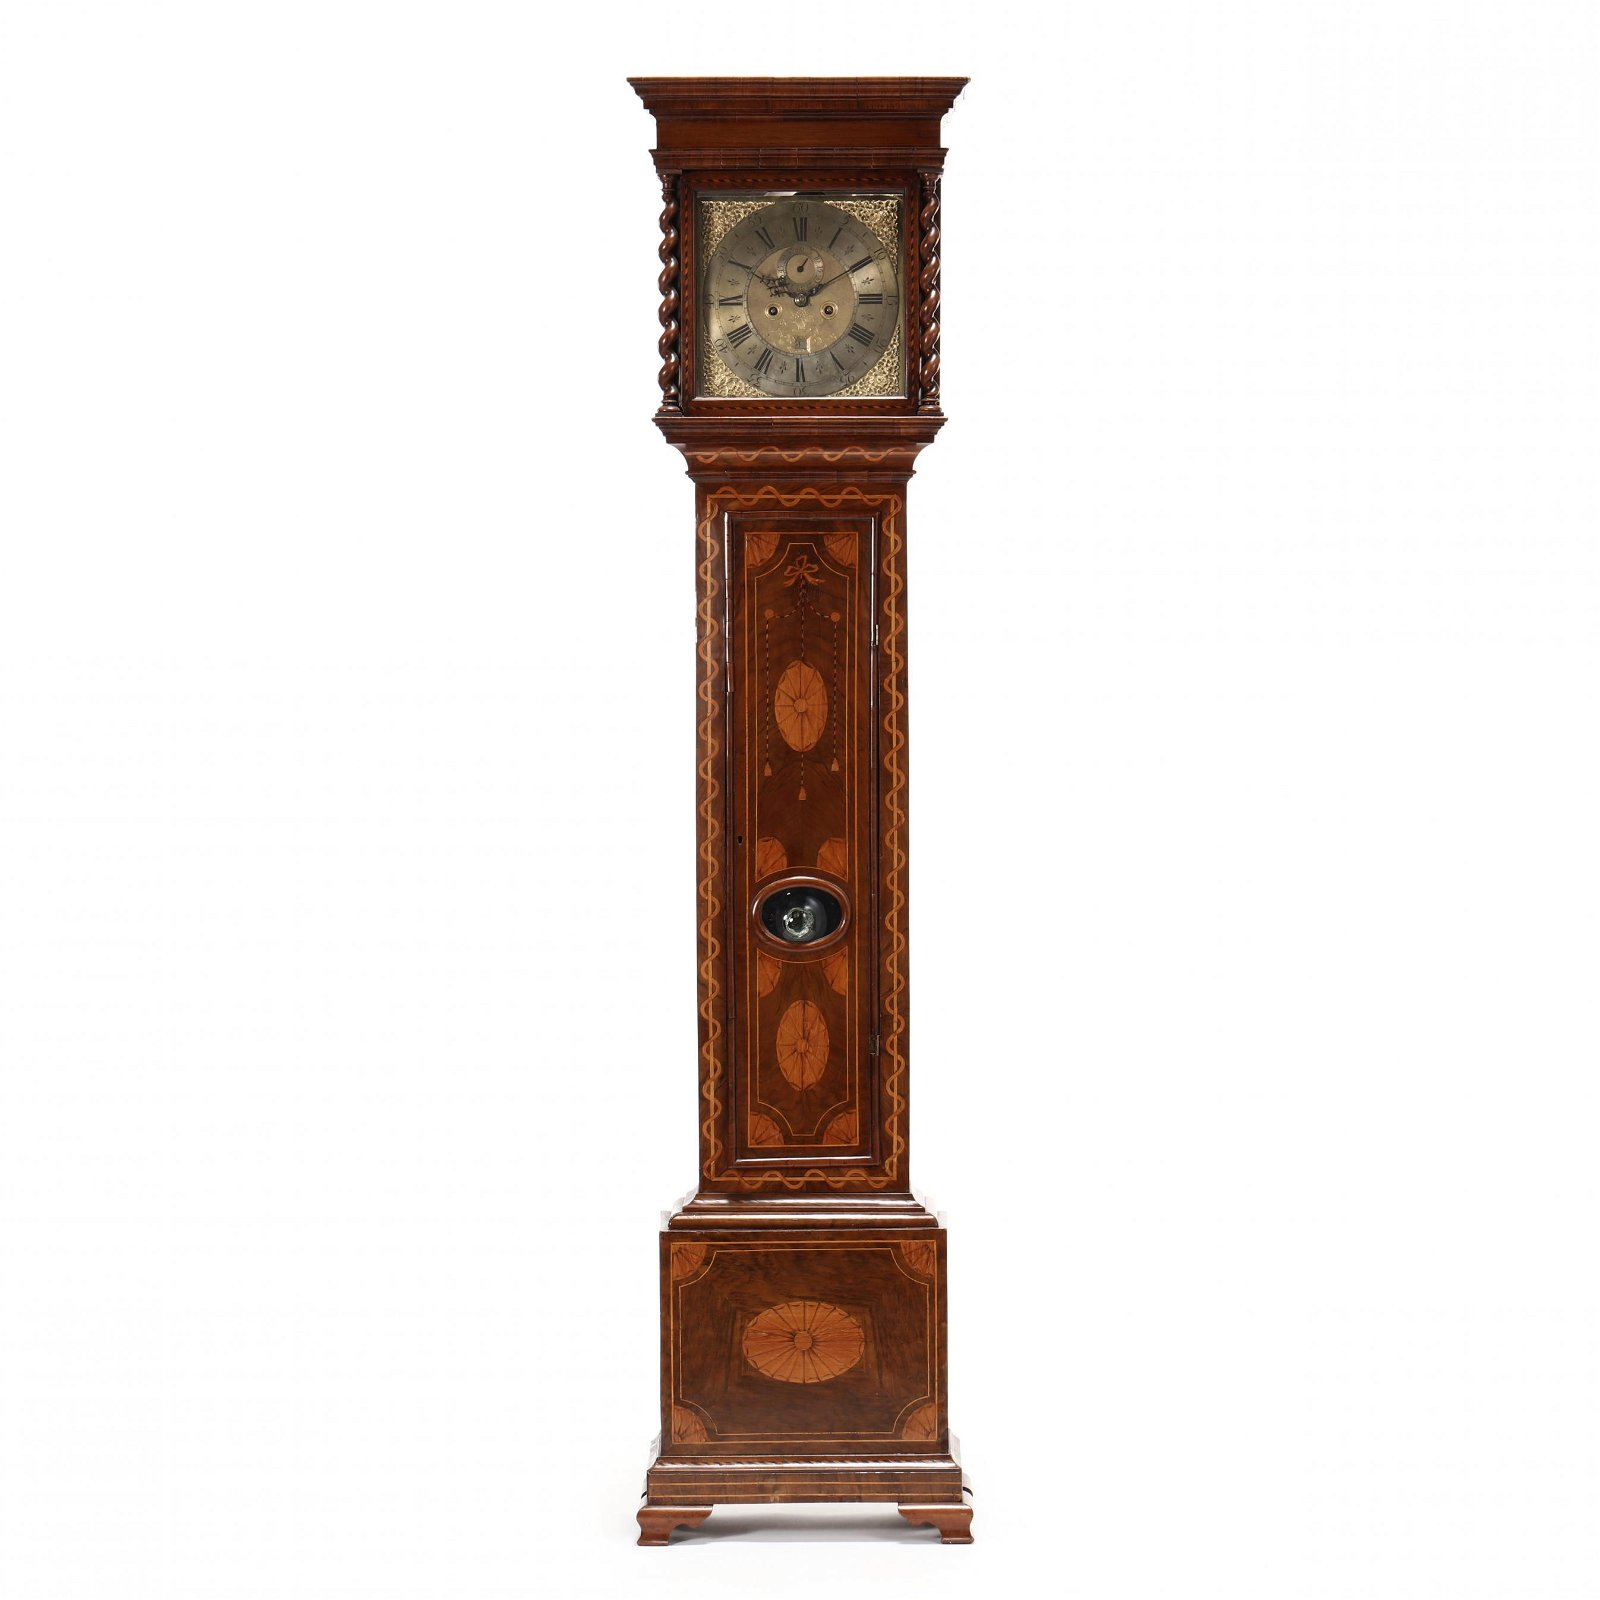 George III Marquetry Inlaid Mahogany Tall Case Clock